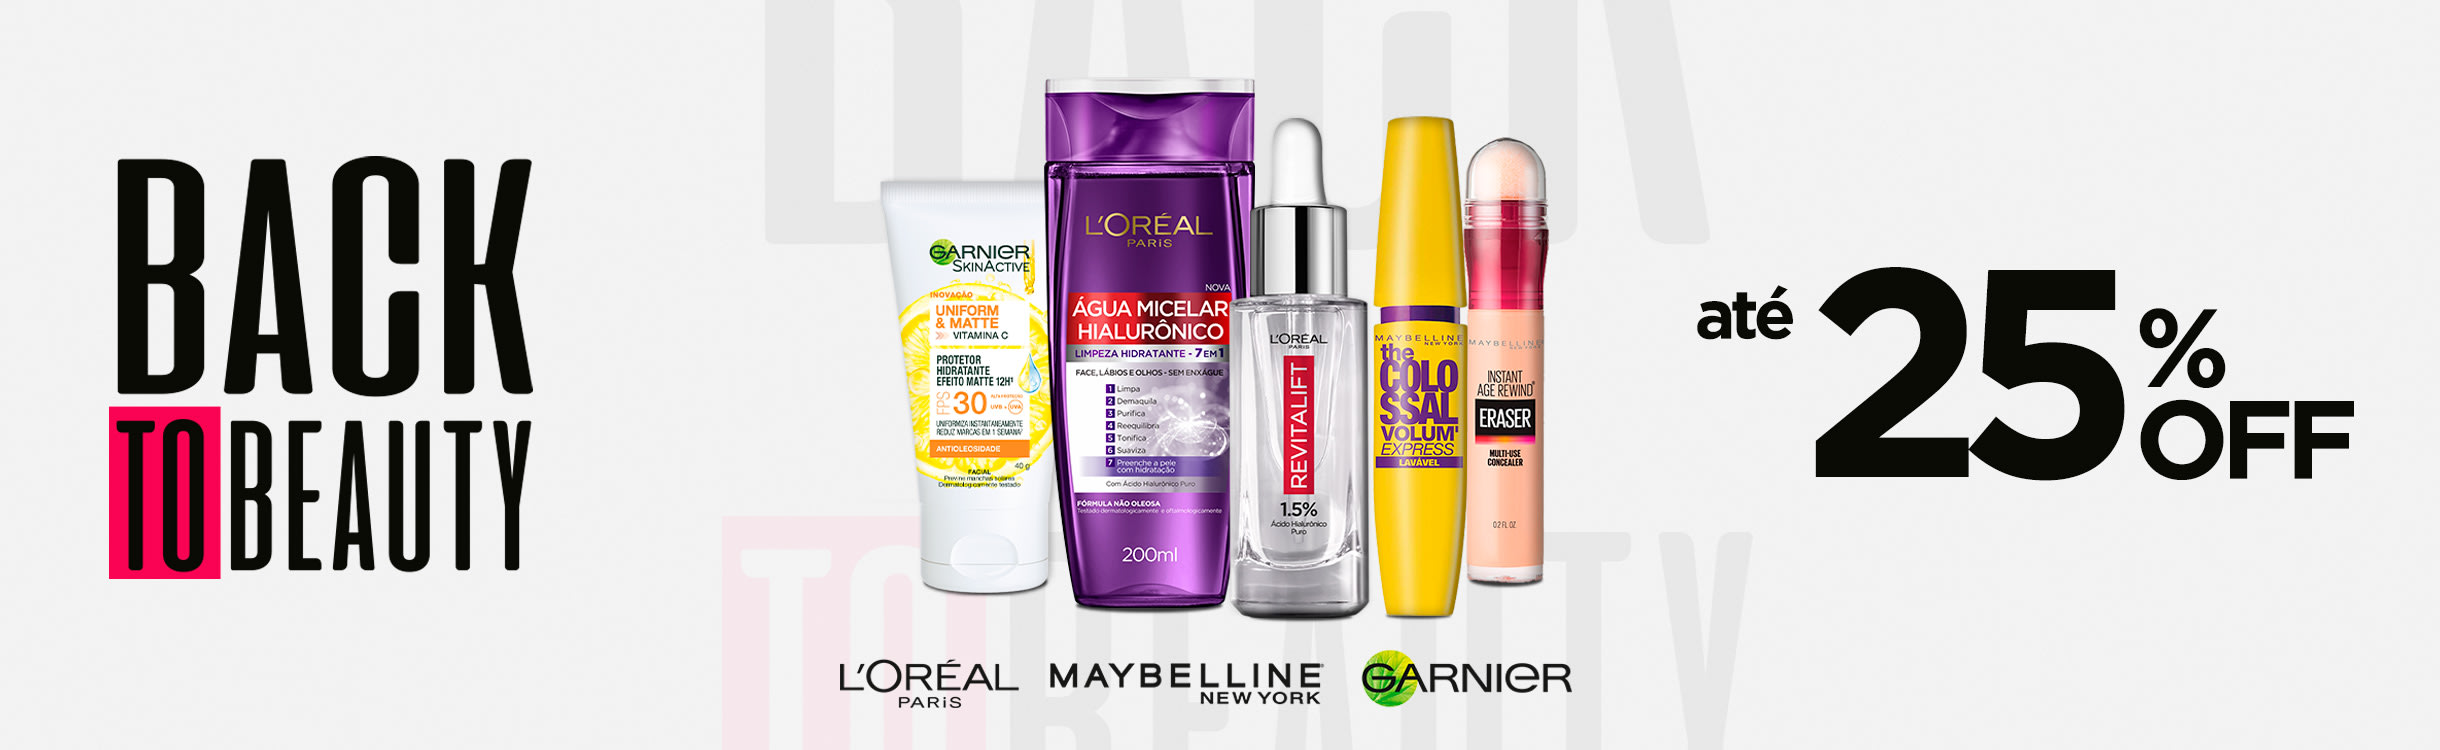 L'oréal   Back to Beauty